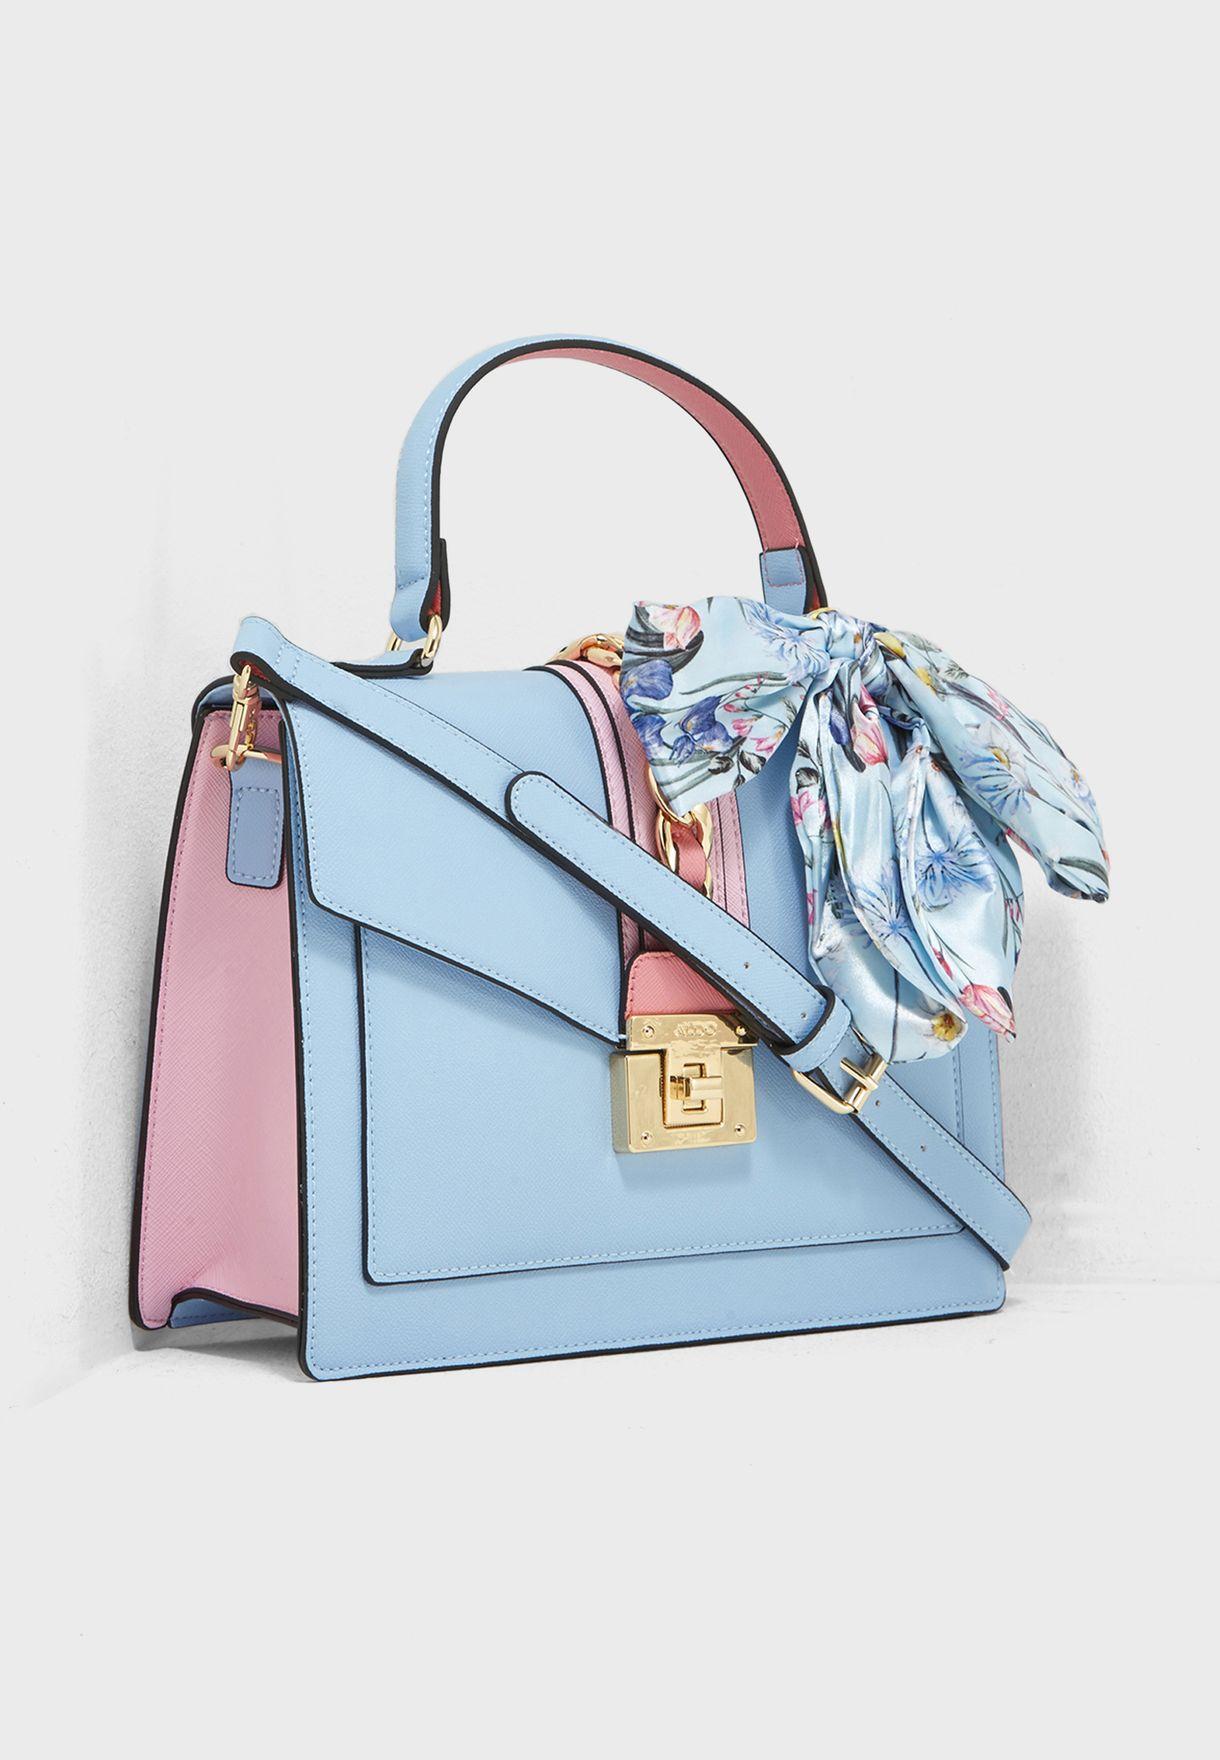 c223b62414c Shop Aldo multicolor Scarf Satchel GLENDAA7 for Women in Bahrain ...